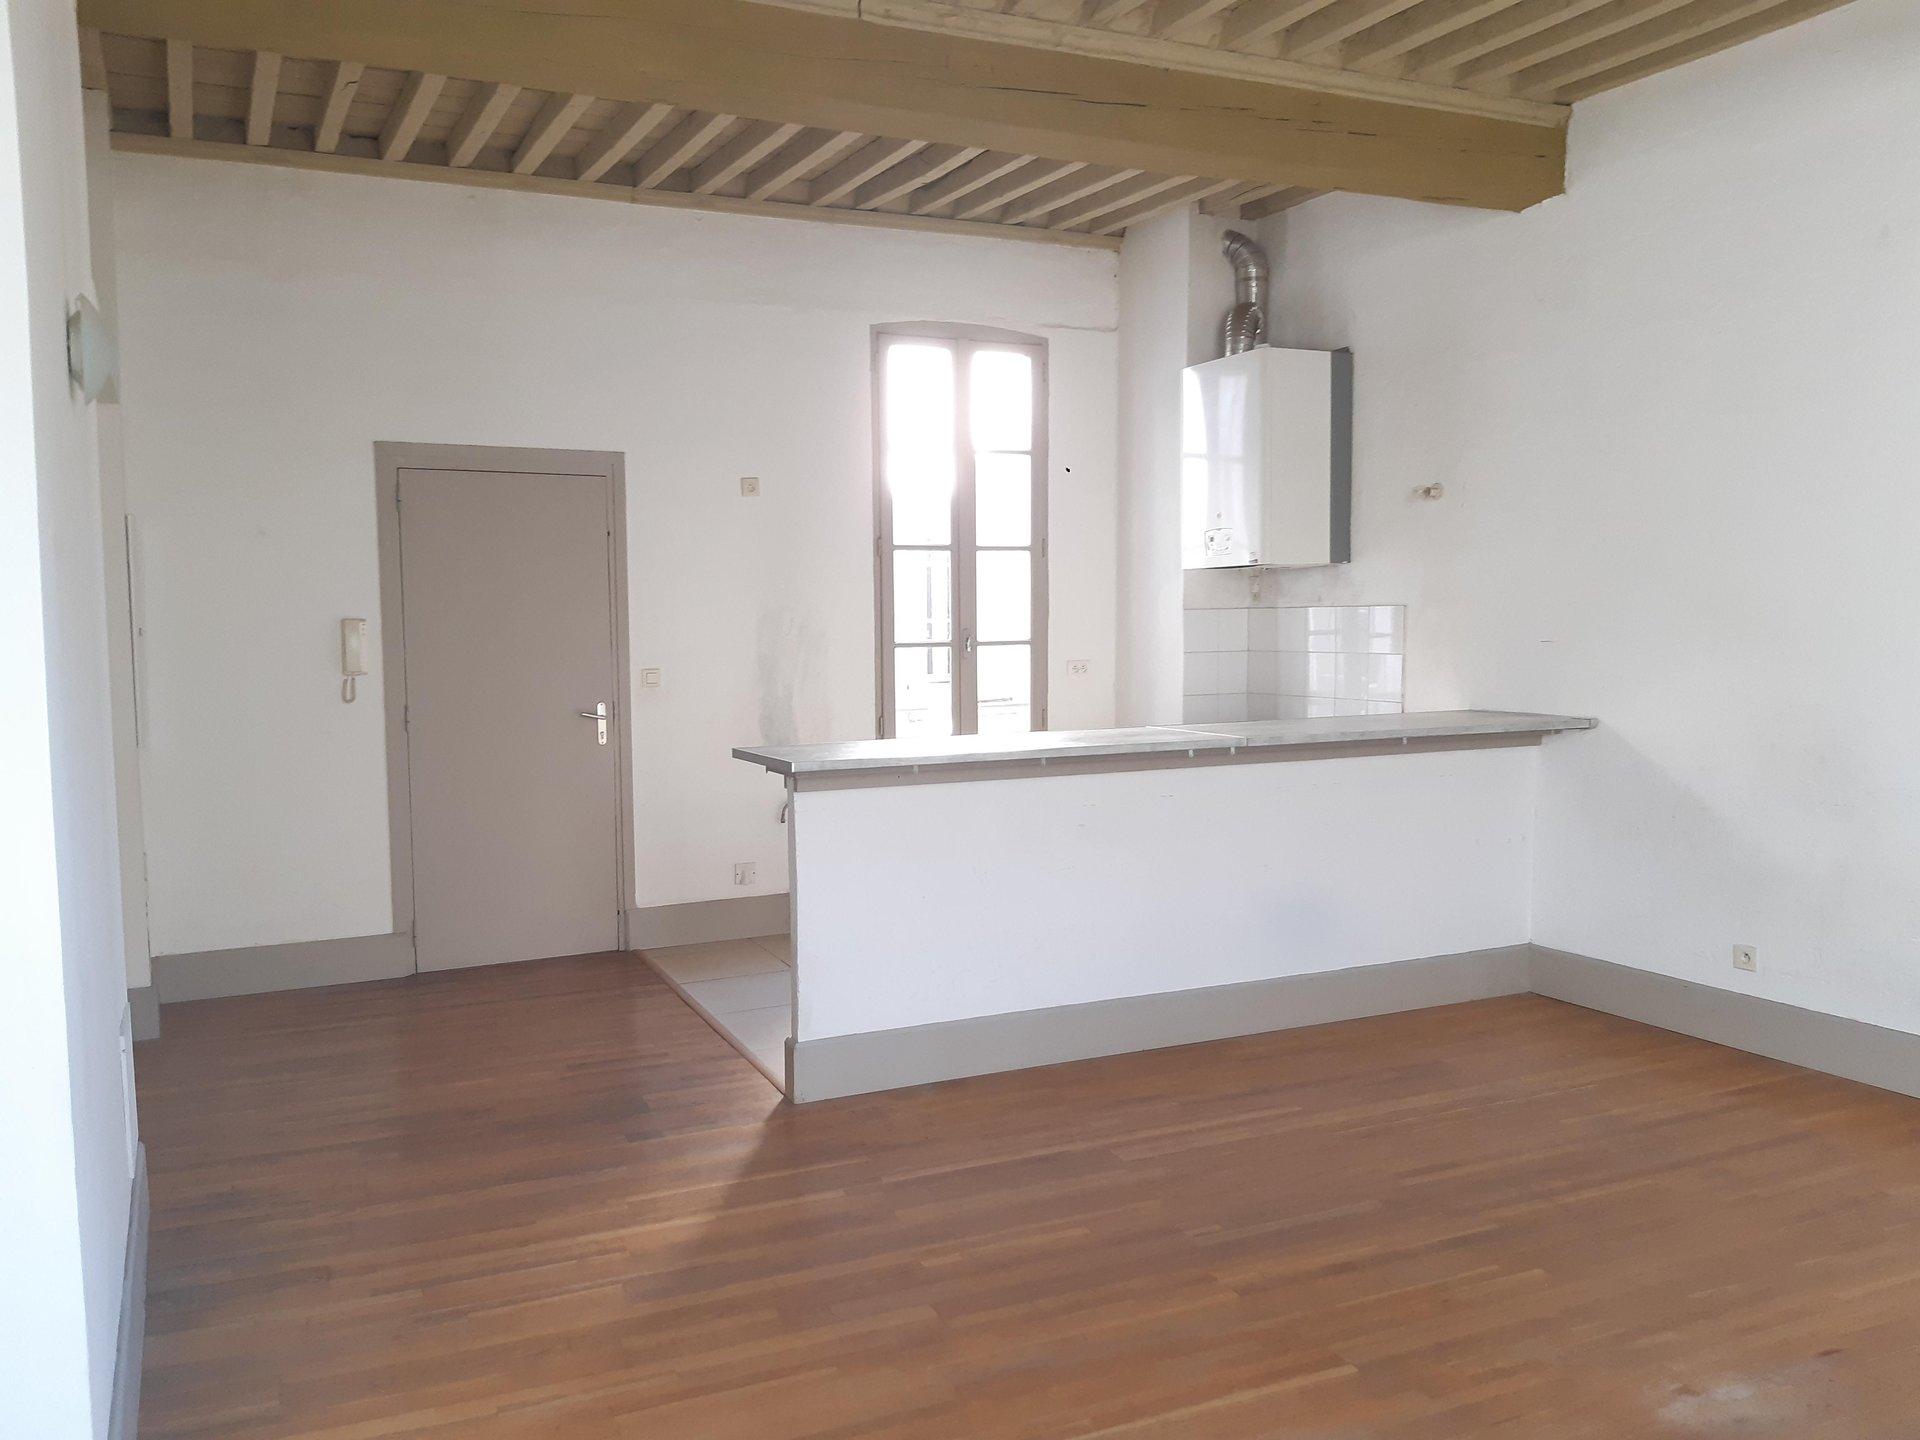 Location Appartement BEAUCAIRE Mandat : 0294